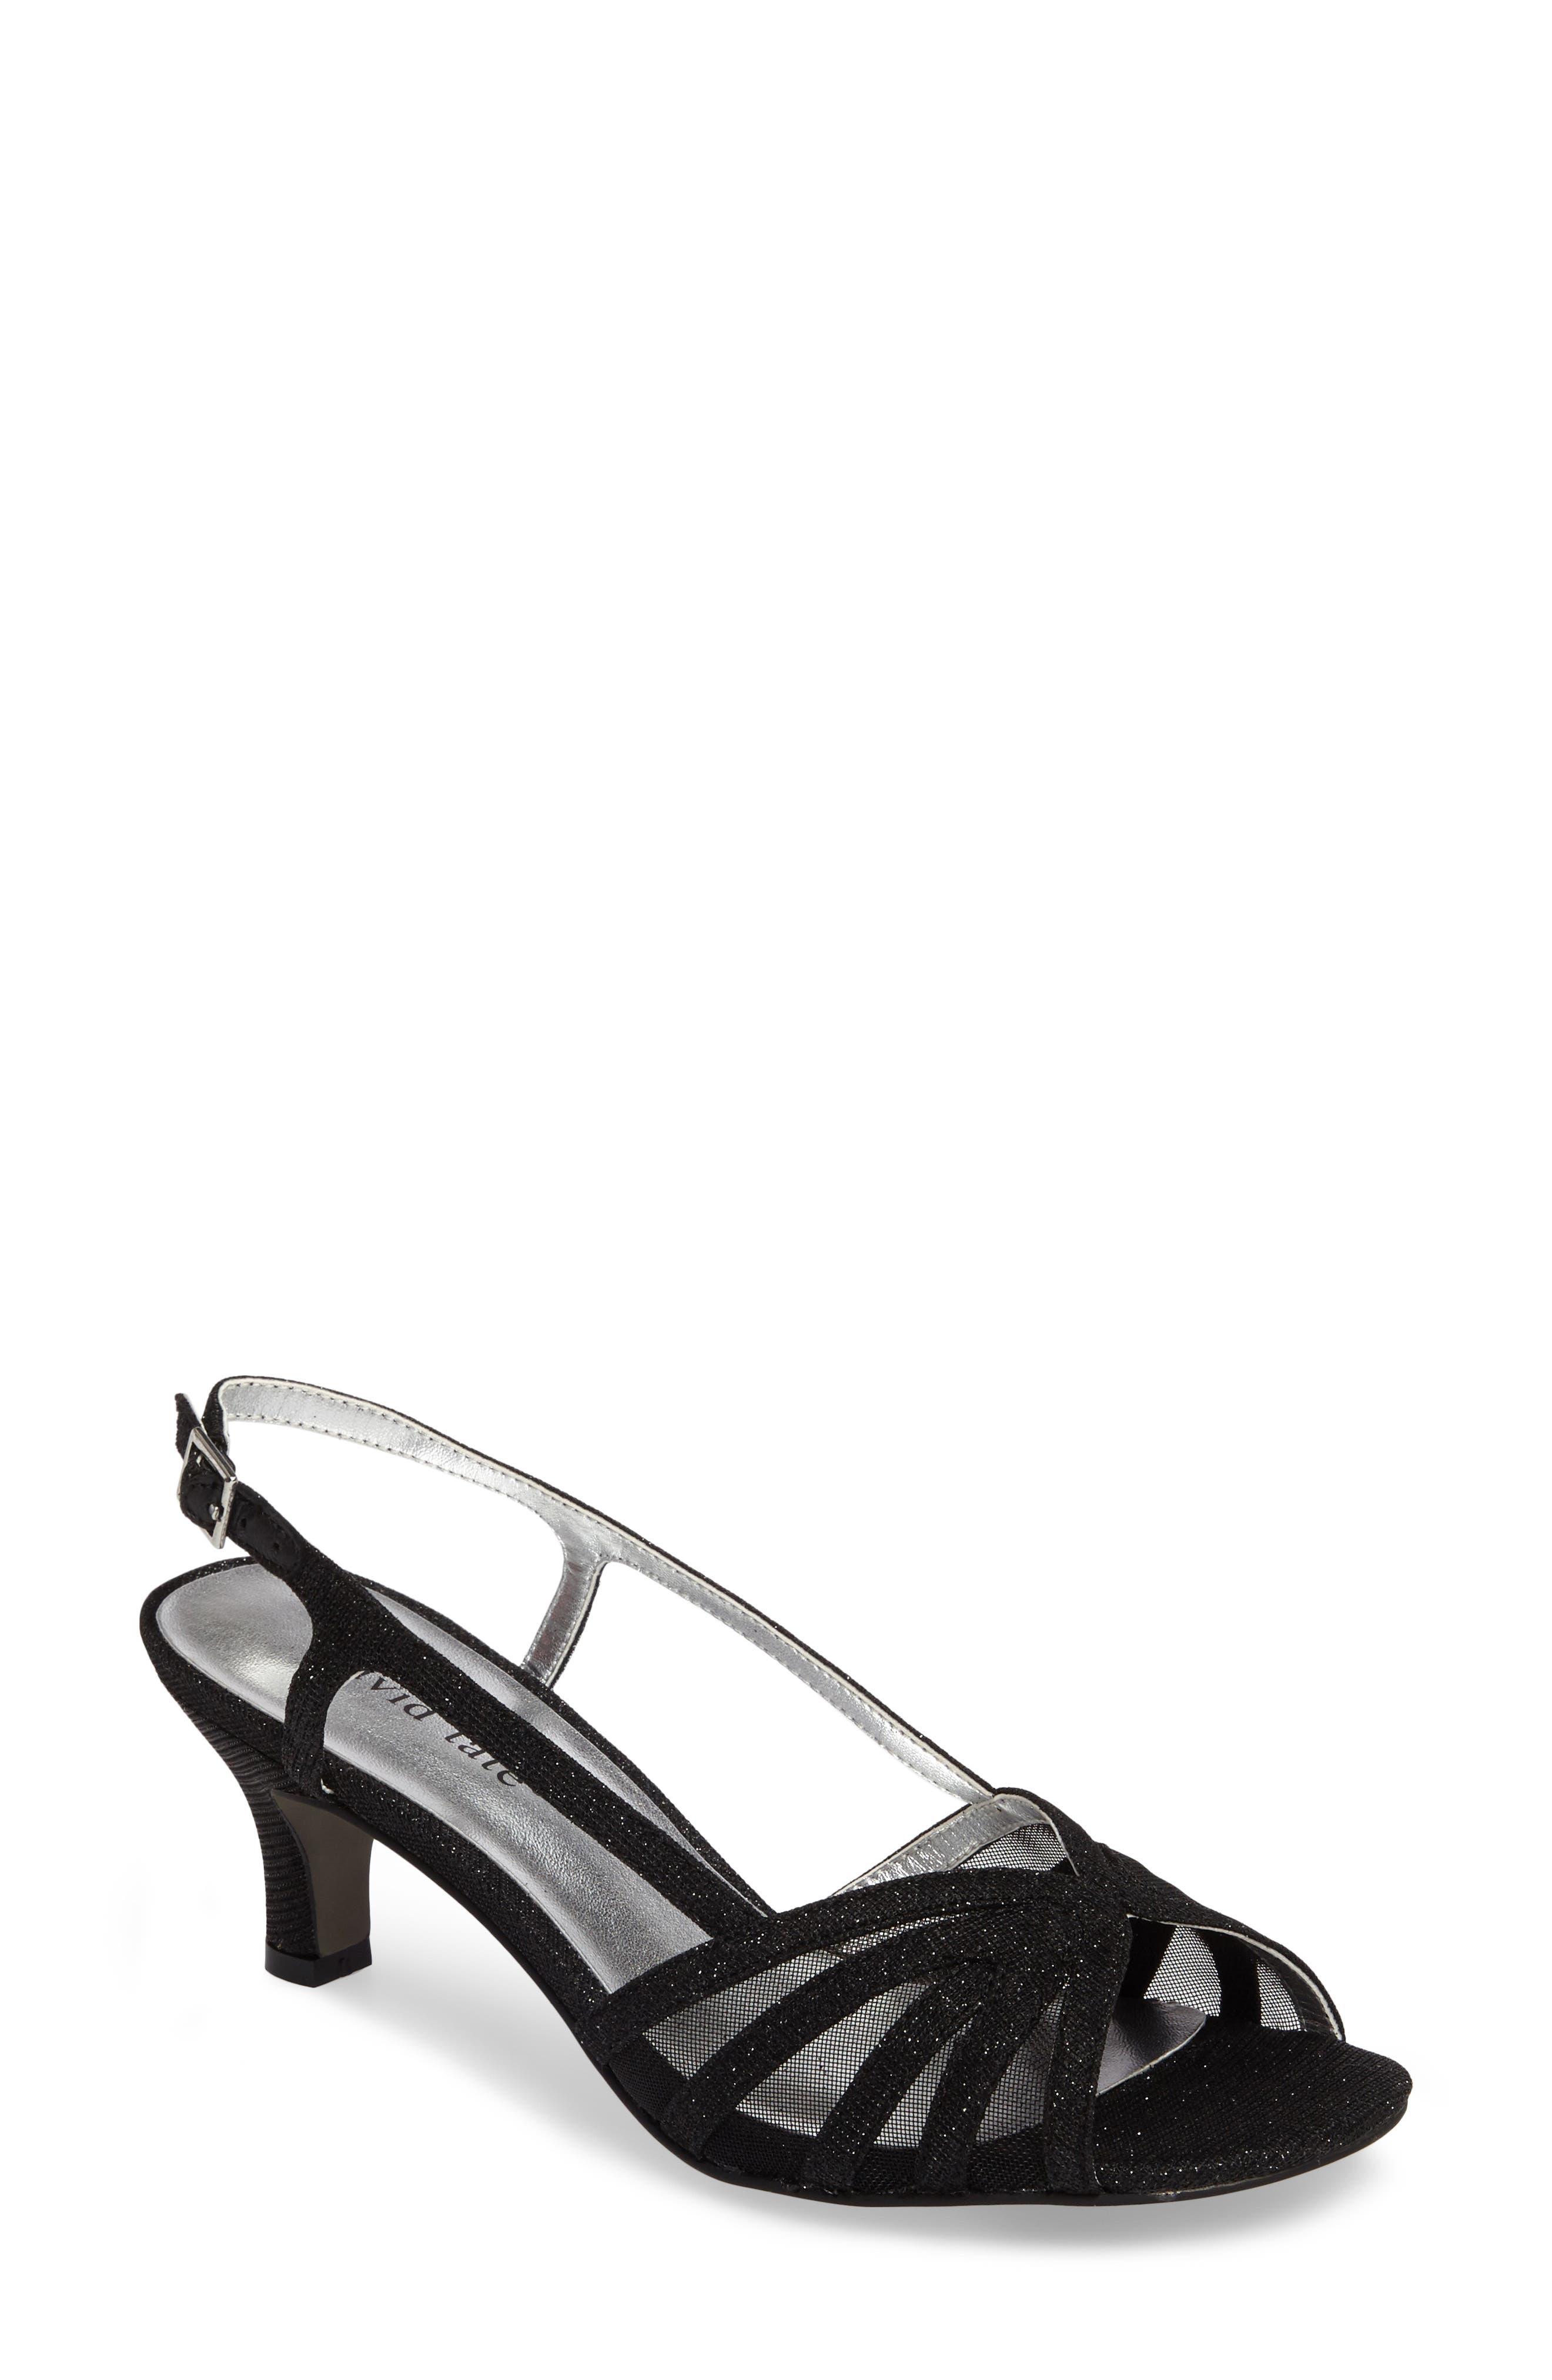 Ritz Slingback Sandal,                         Main,                         color, Black